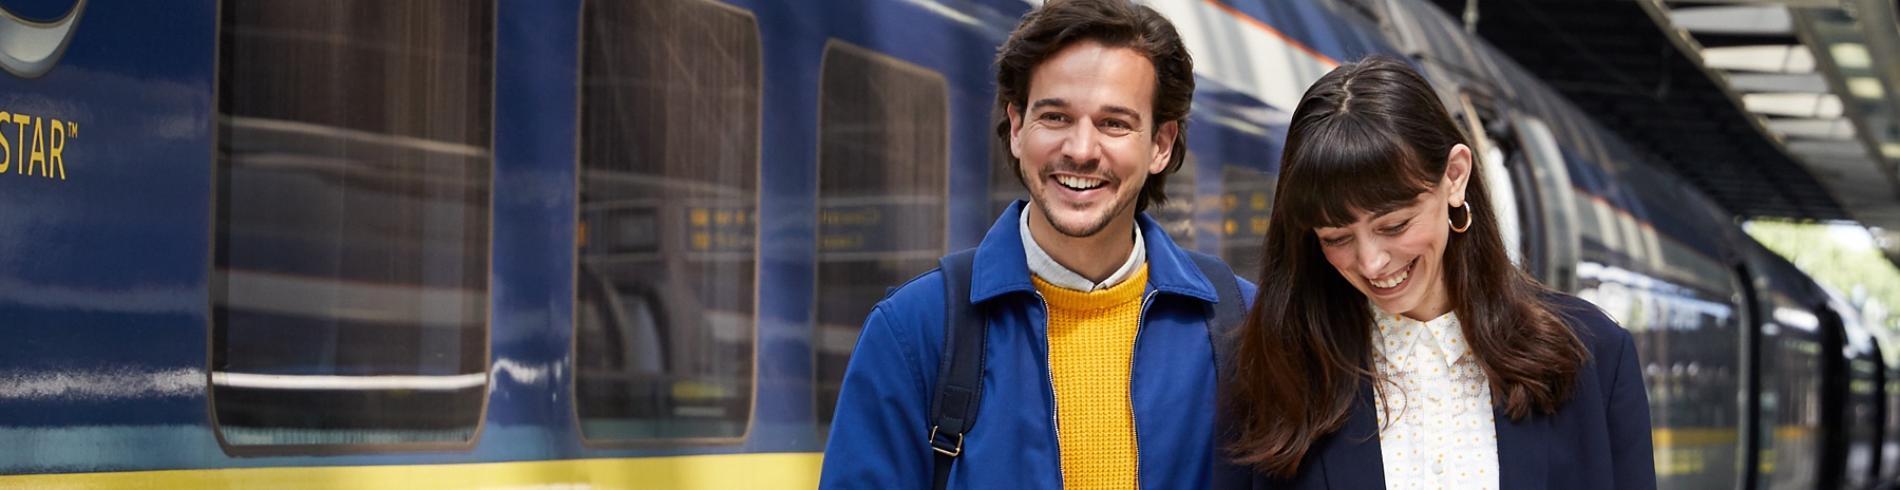 Man and woman by Eurostar train